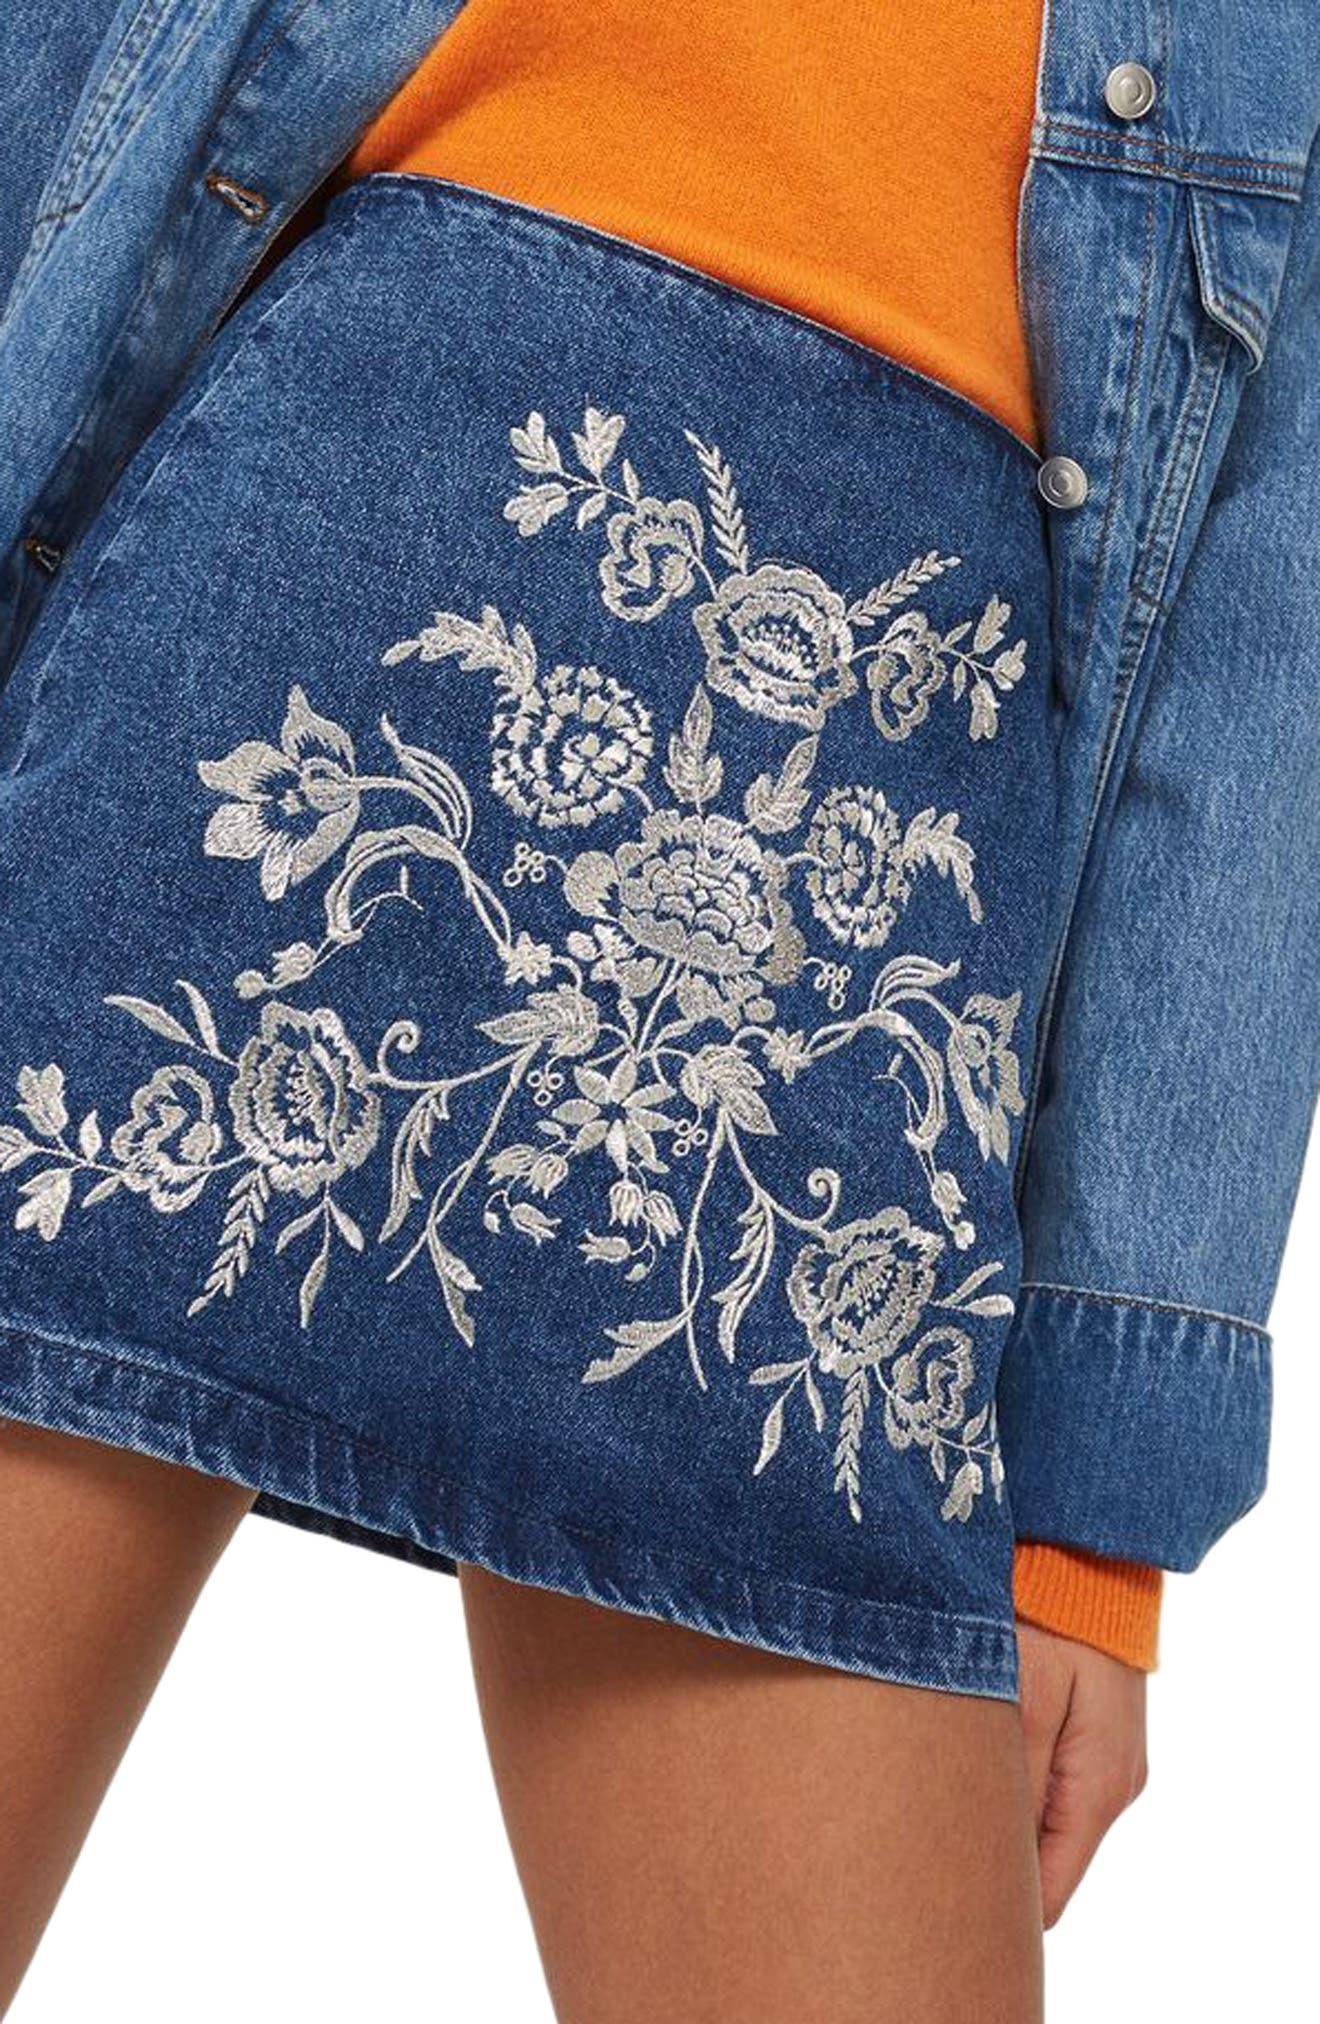 Floral Embroidered A-Line Skirt,                             Alternate thumbnail 2, color,                             Mid Denim